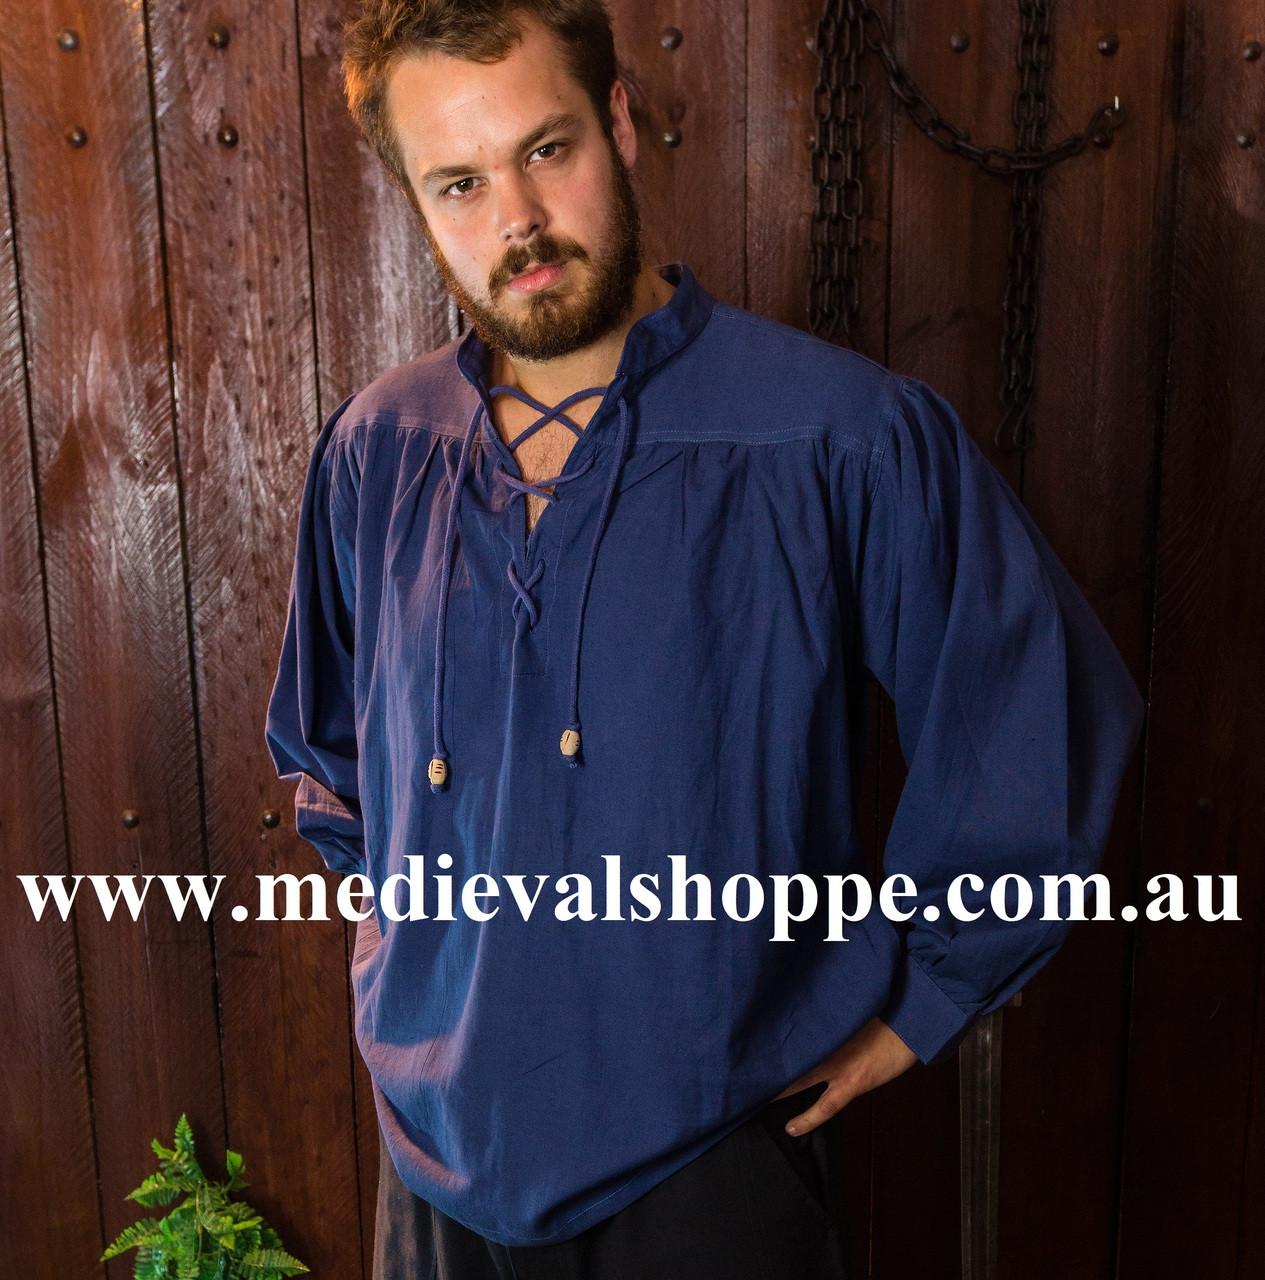 Cotton Late Medieval or Renaissance shirt.